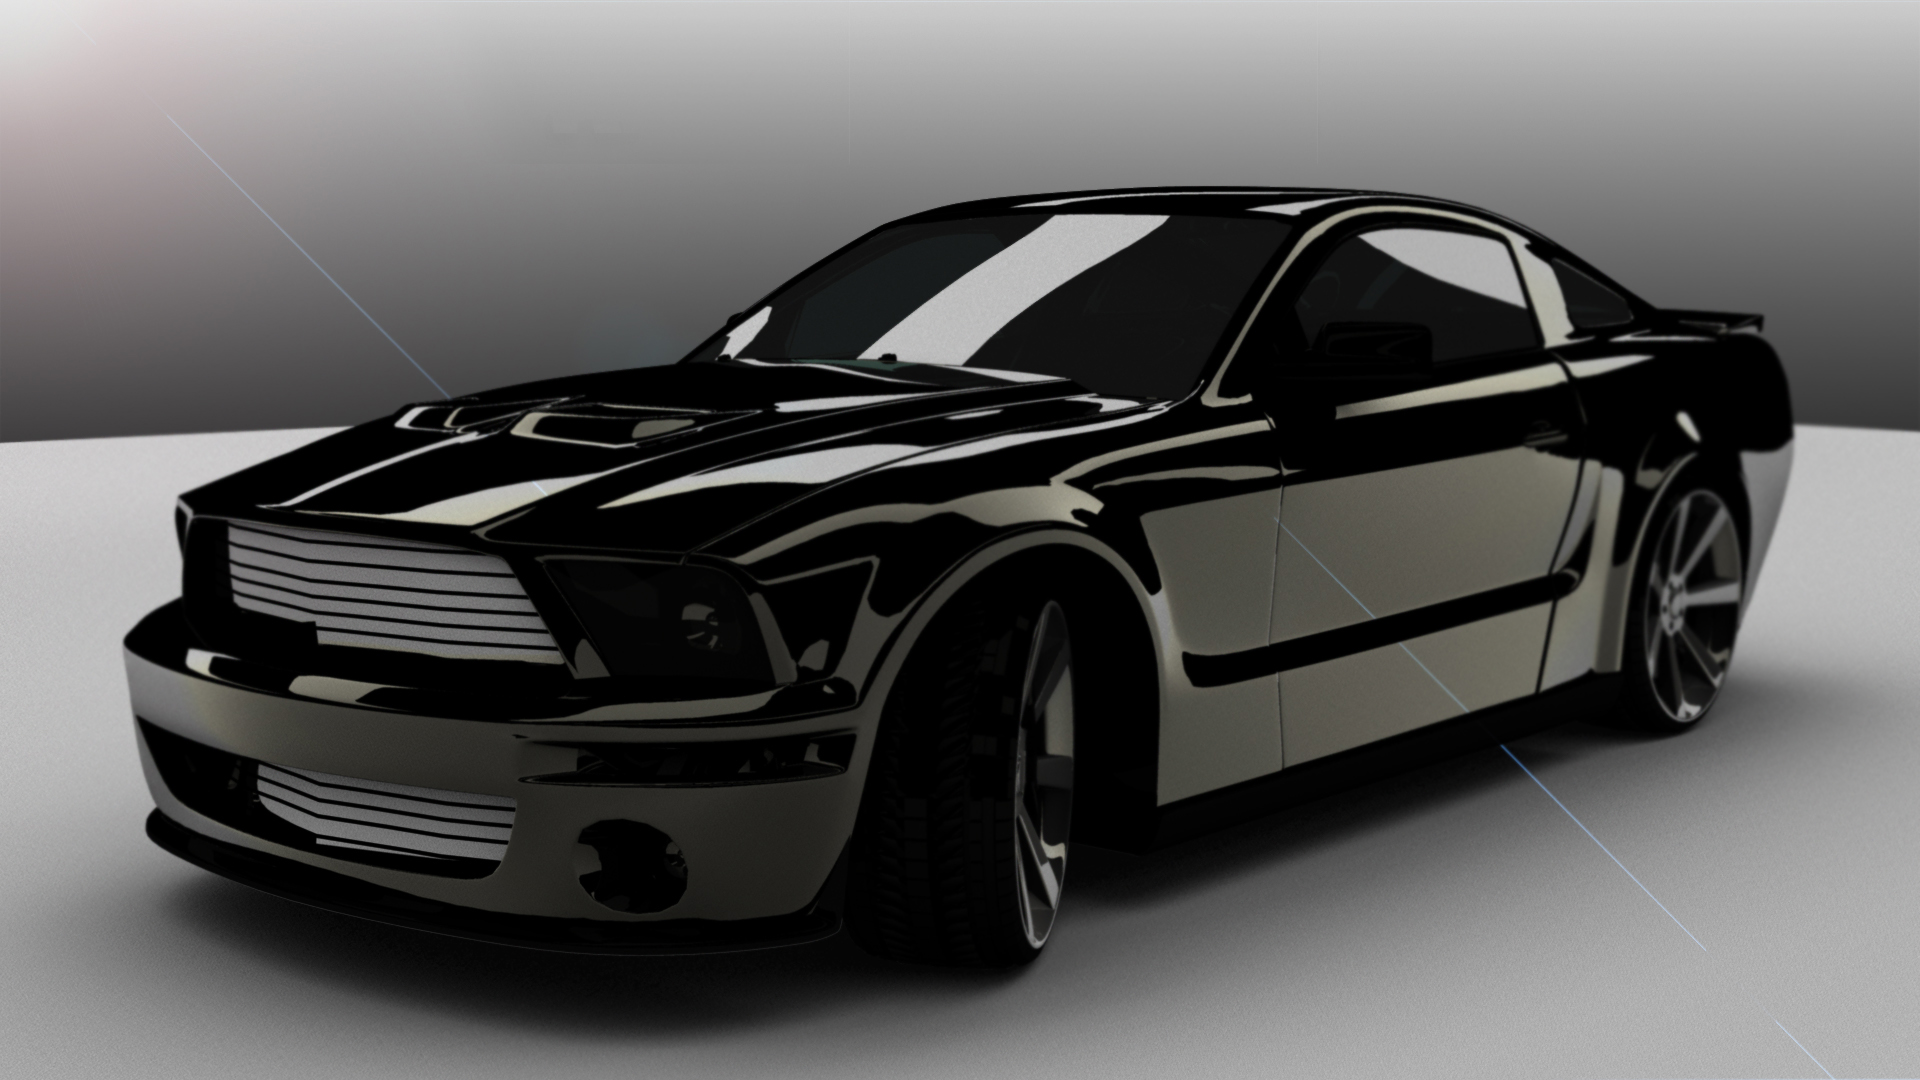 2011 Mustang Cobra Wallpaper Parts for Mustang 1920x1080